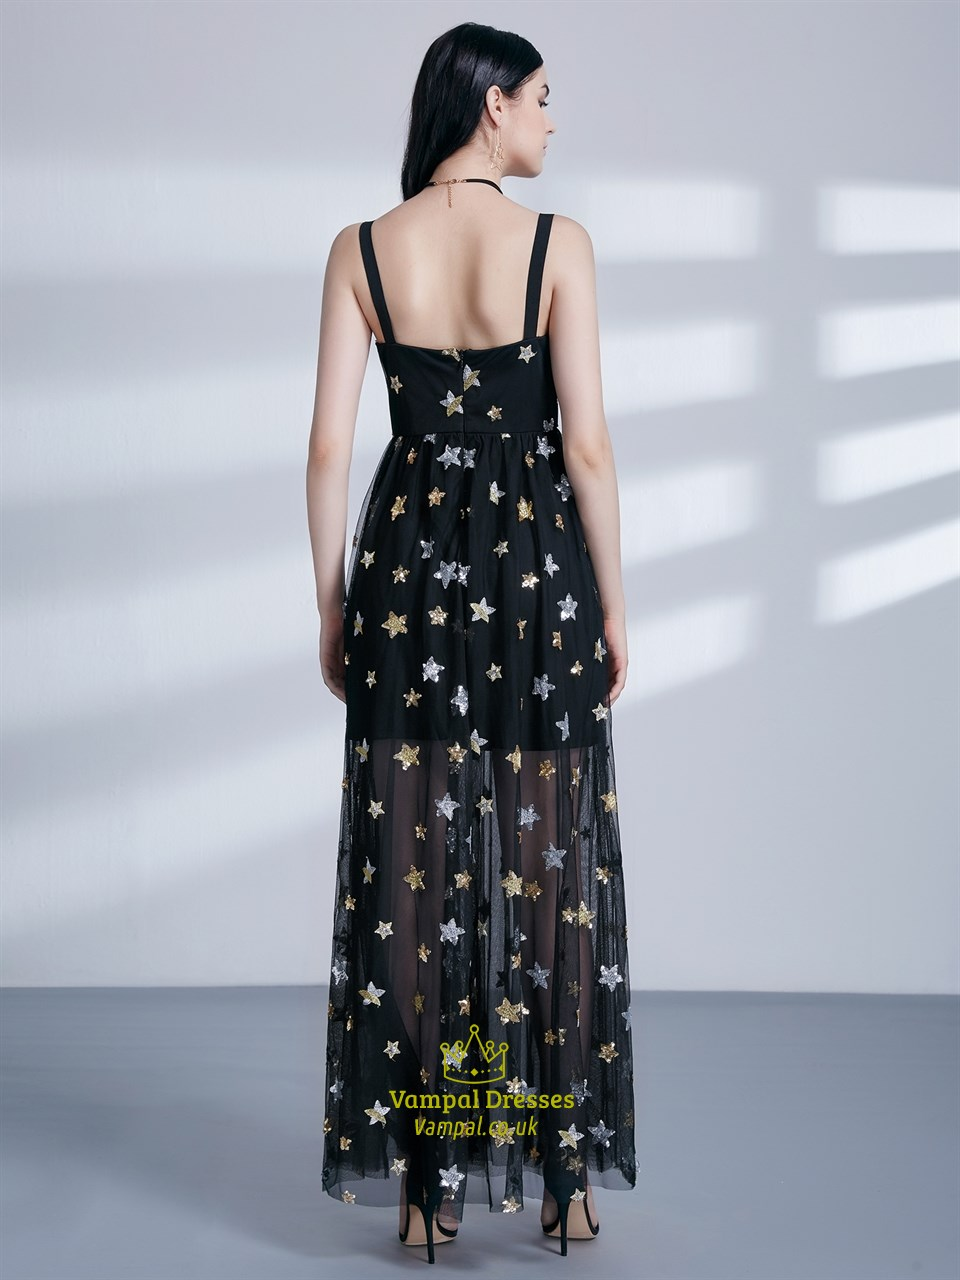 Long A Line Black Square Neck Sleeveless Tulle Maxi Dress